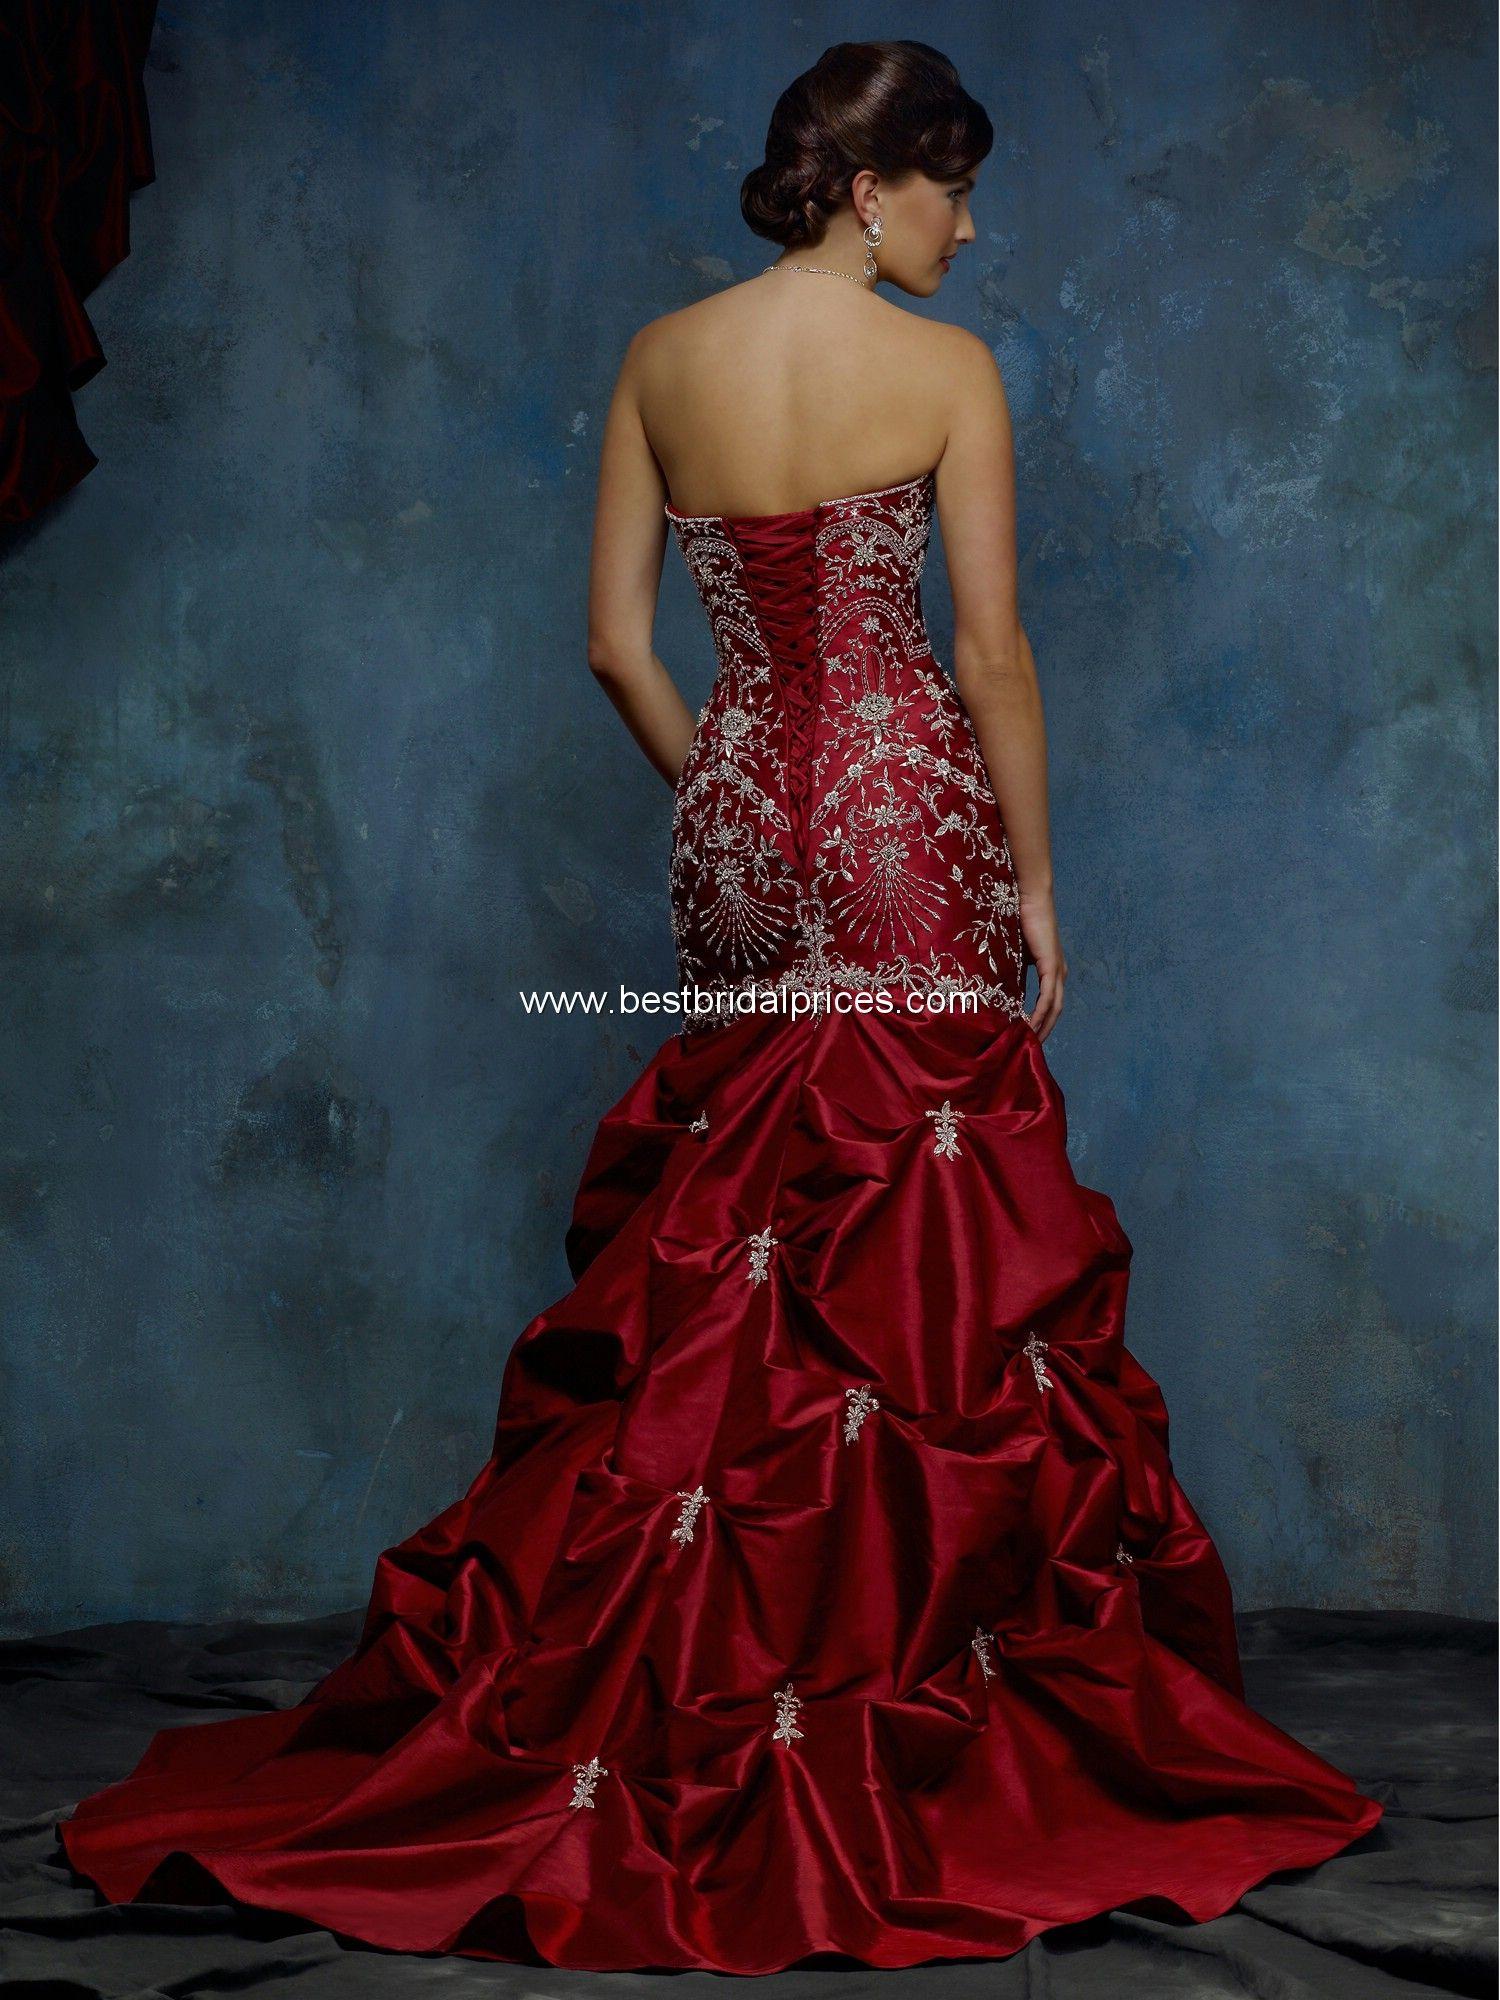 Wild West Wedding Dresses Red Wedding Dress. An